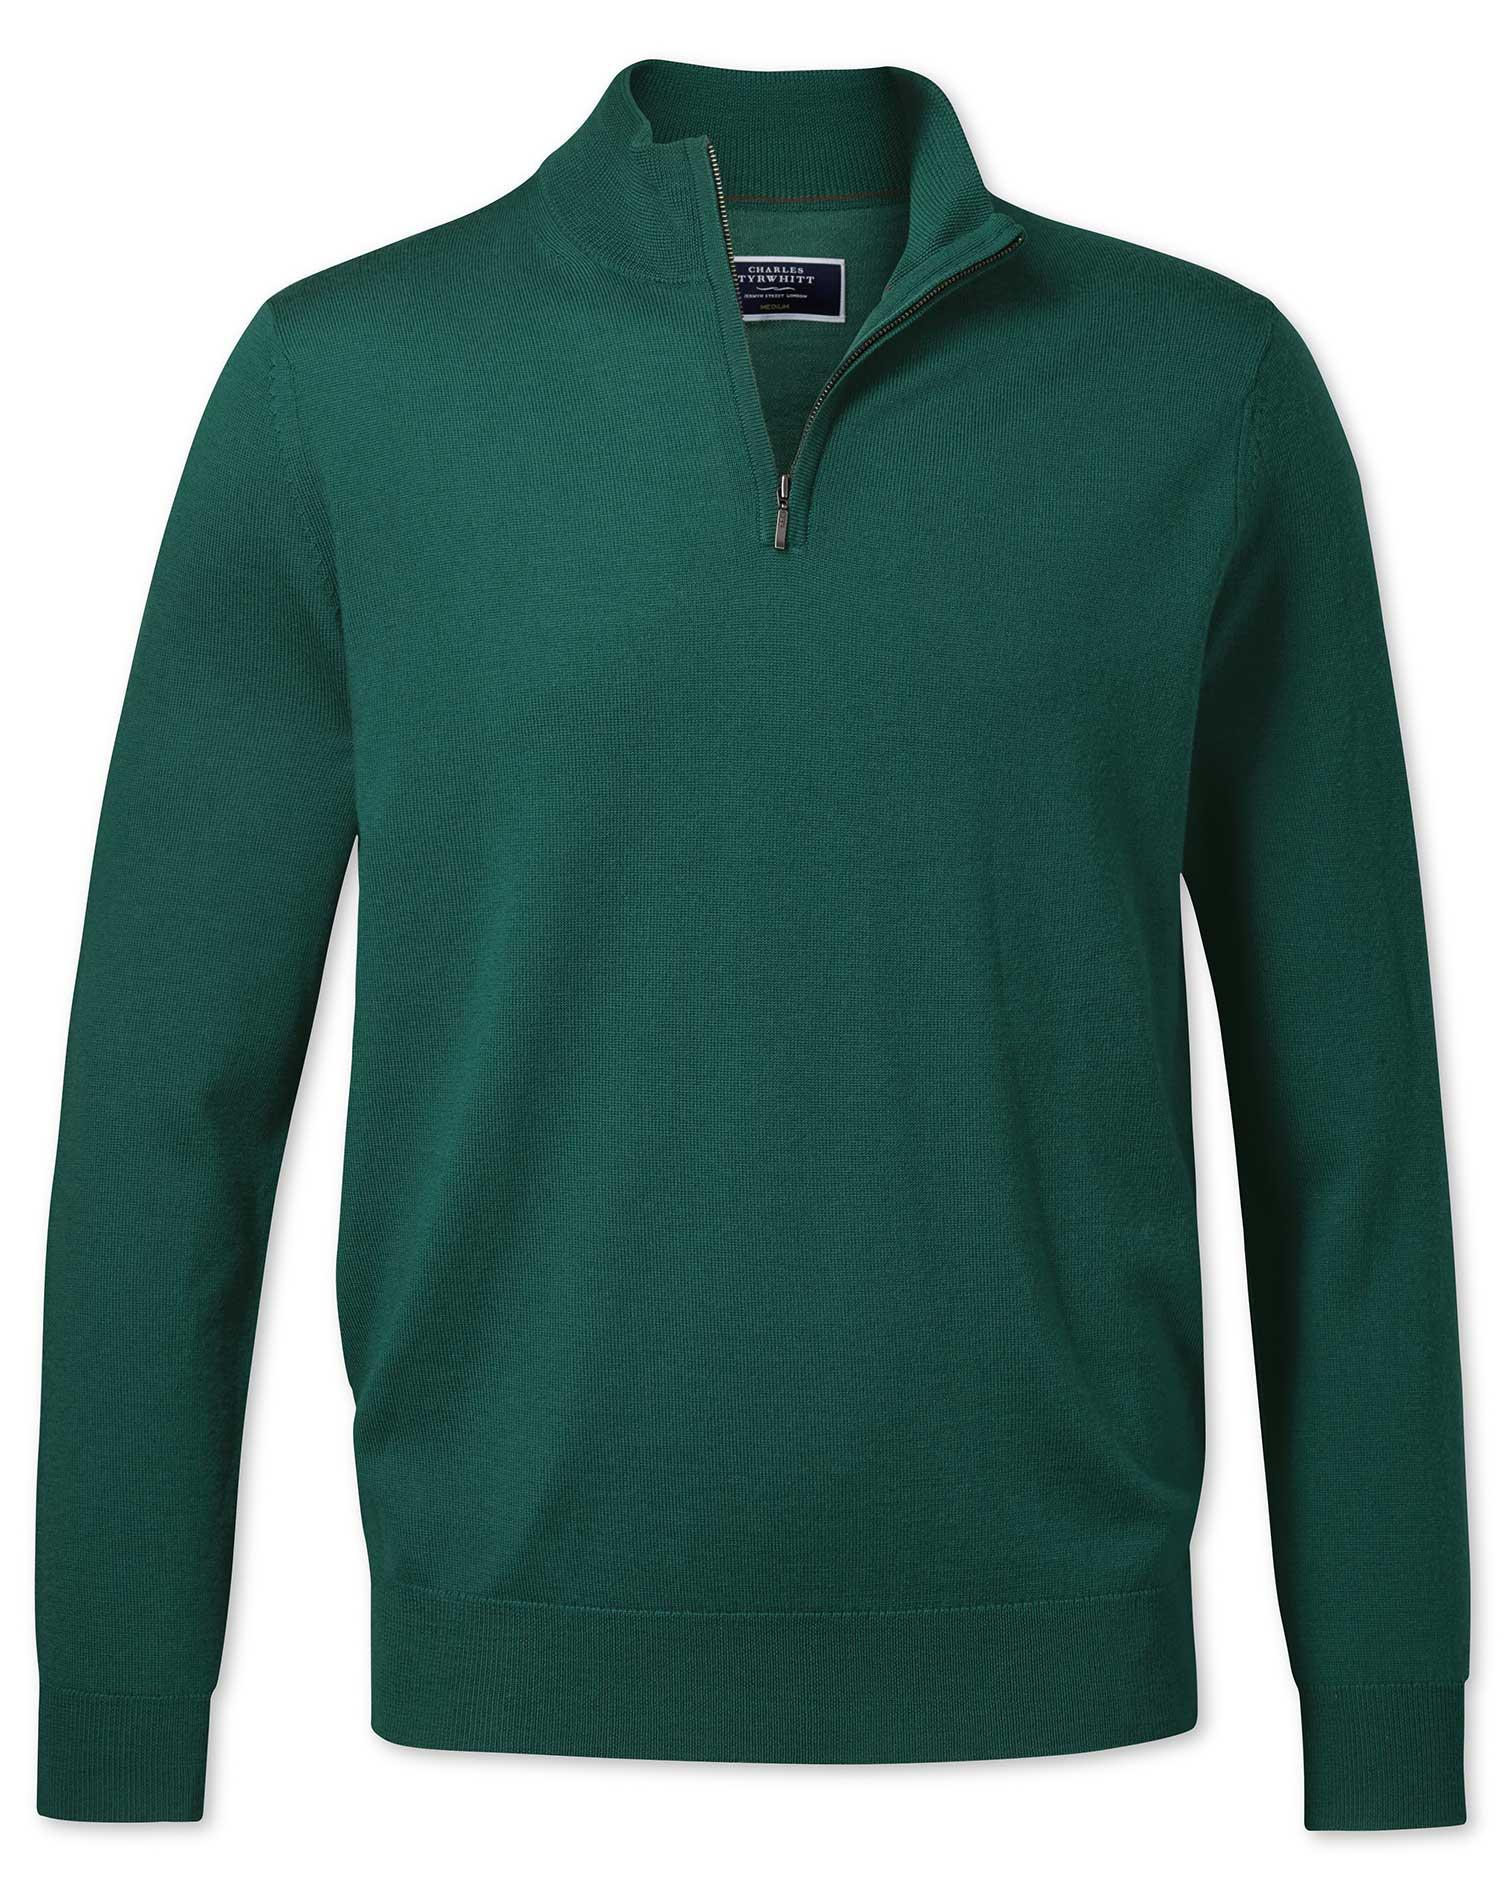 Dark Green Merino Zip Neck Merino Wool Jumper Size XL by Charles Tyrwhitt